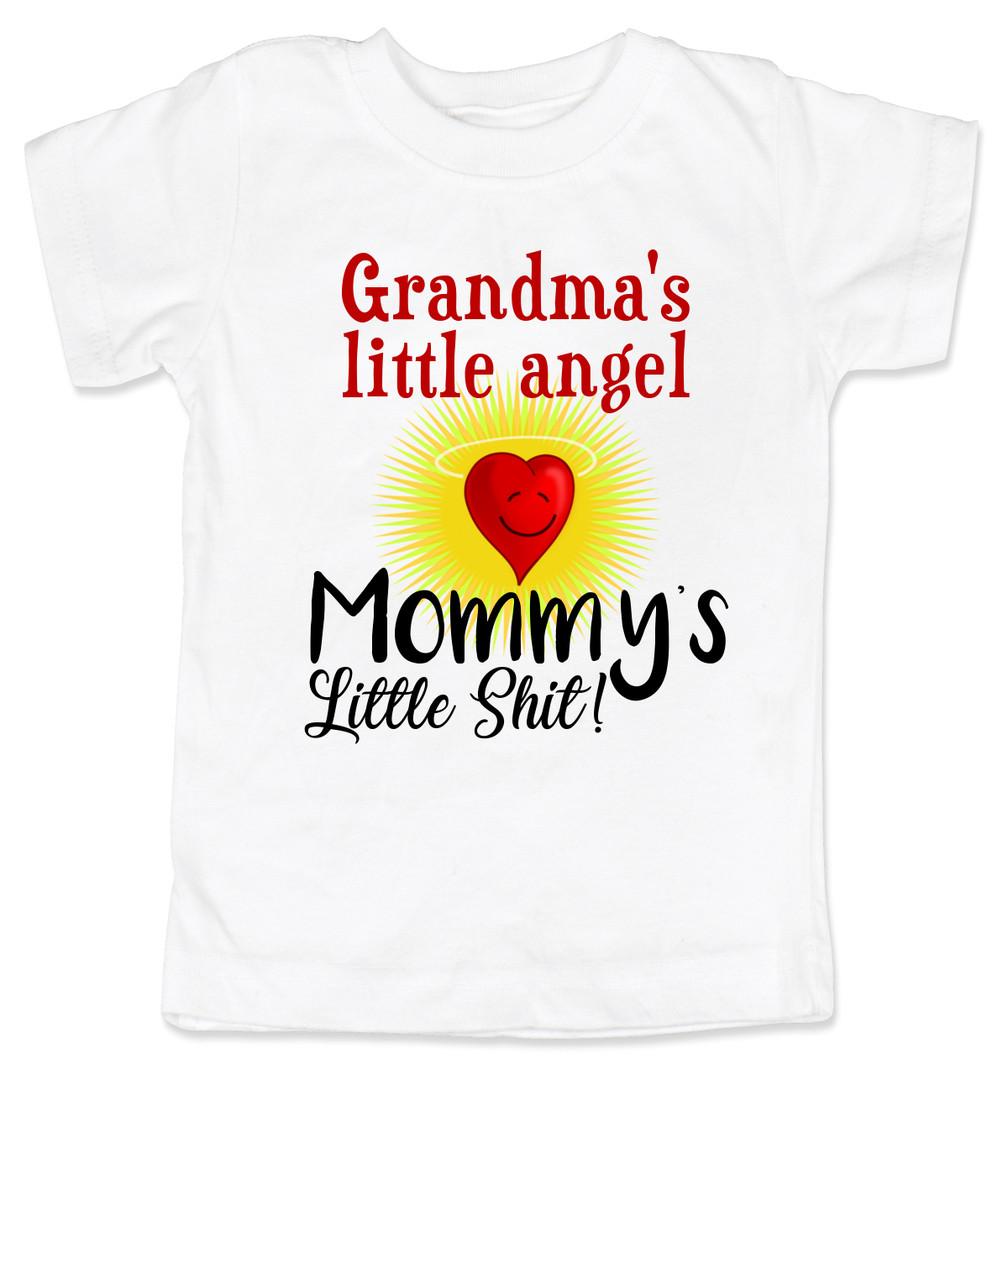 Vulgar baby badass baby threads mommys little shit grandmas little angel toddler shirt little shit toddler tshirt funny negle Image collections